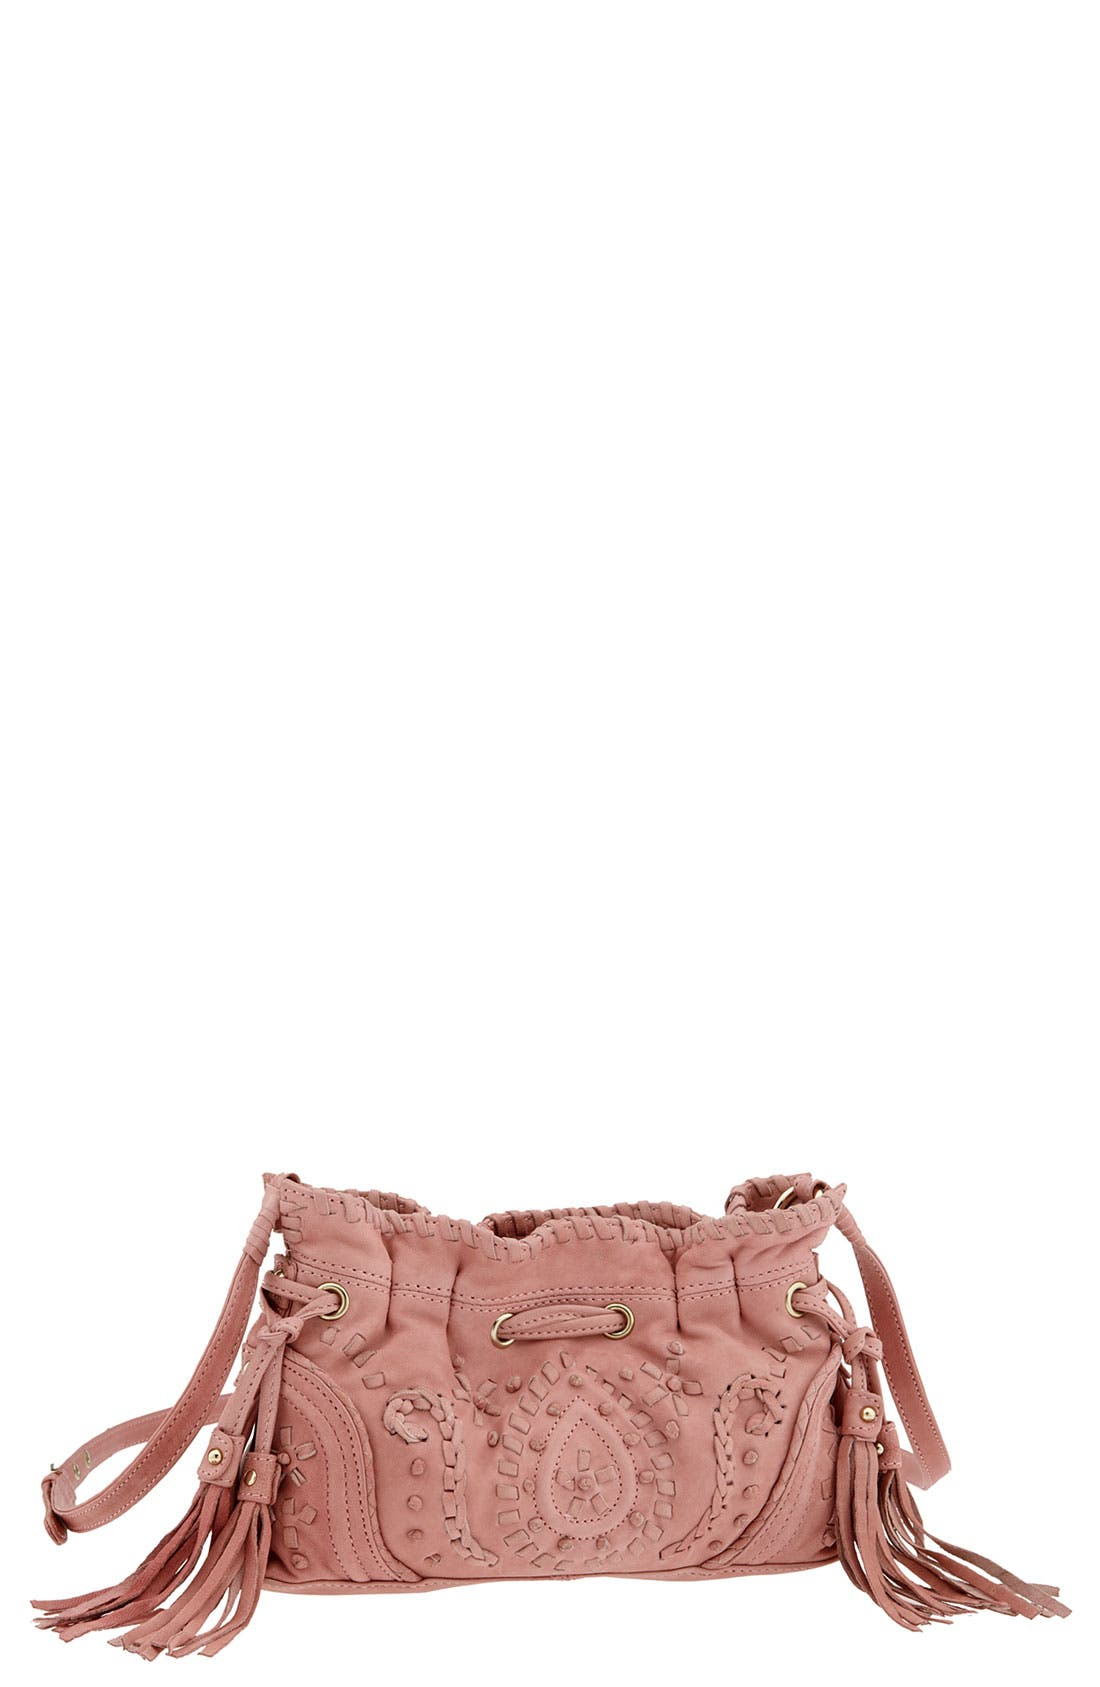 Main Image - Junior Drake 'Mini' Embroidered Drawstring Crossbody Bag